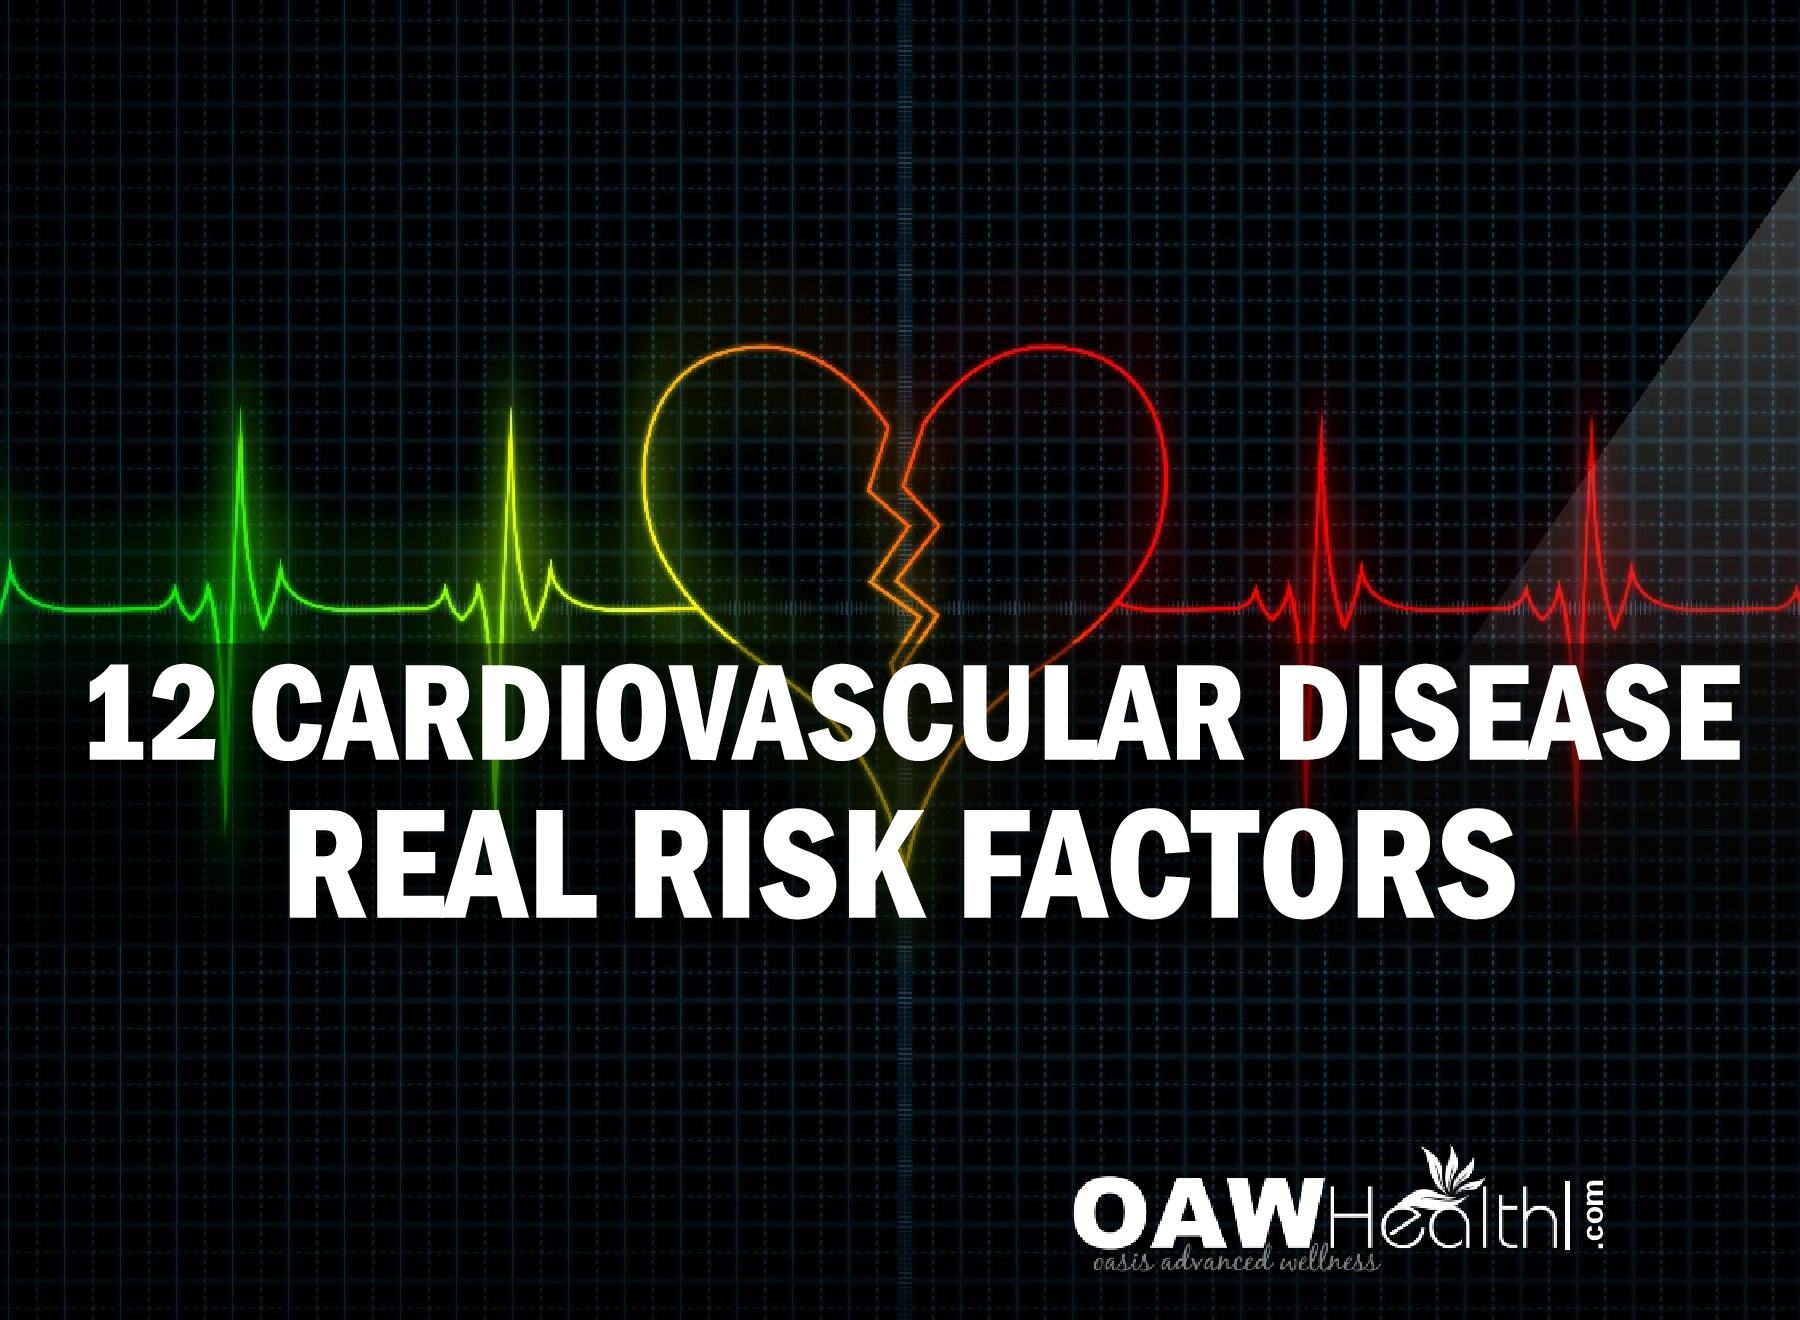 12 Cardiovascular Disease Real-Risk Factors